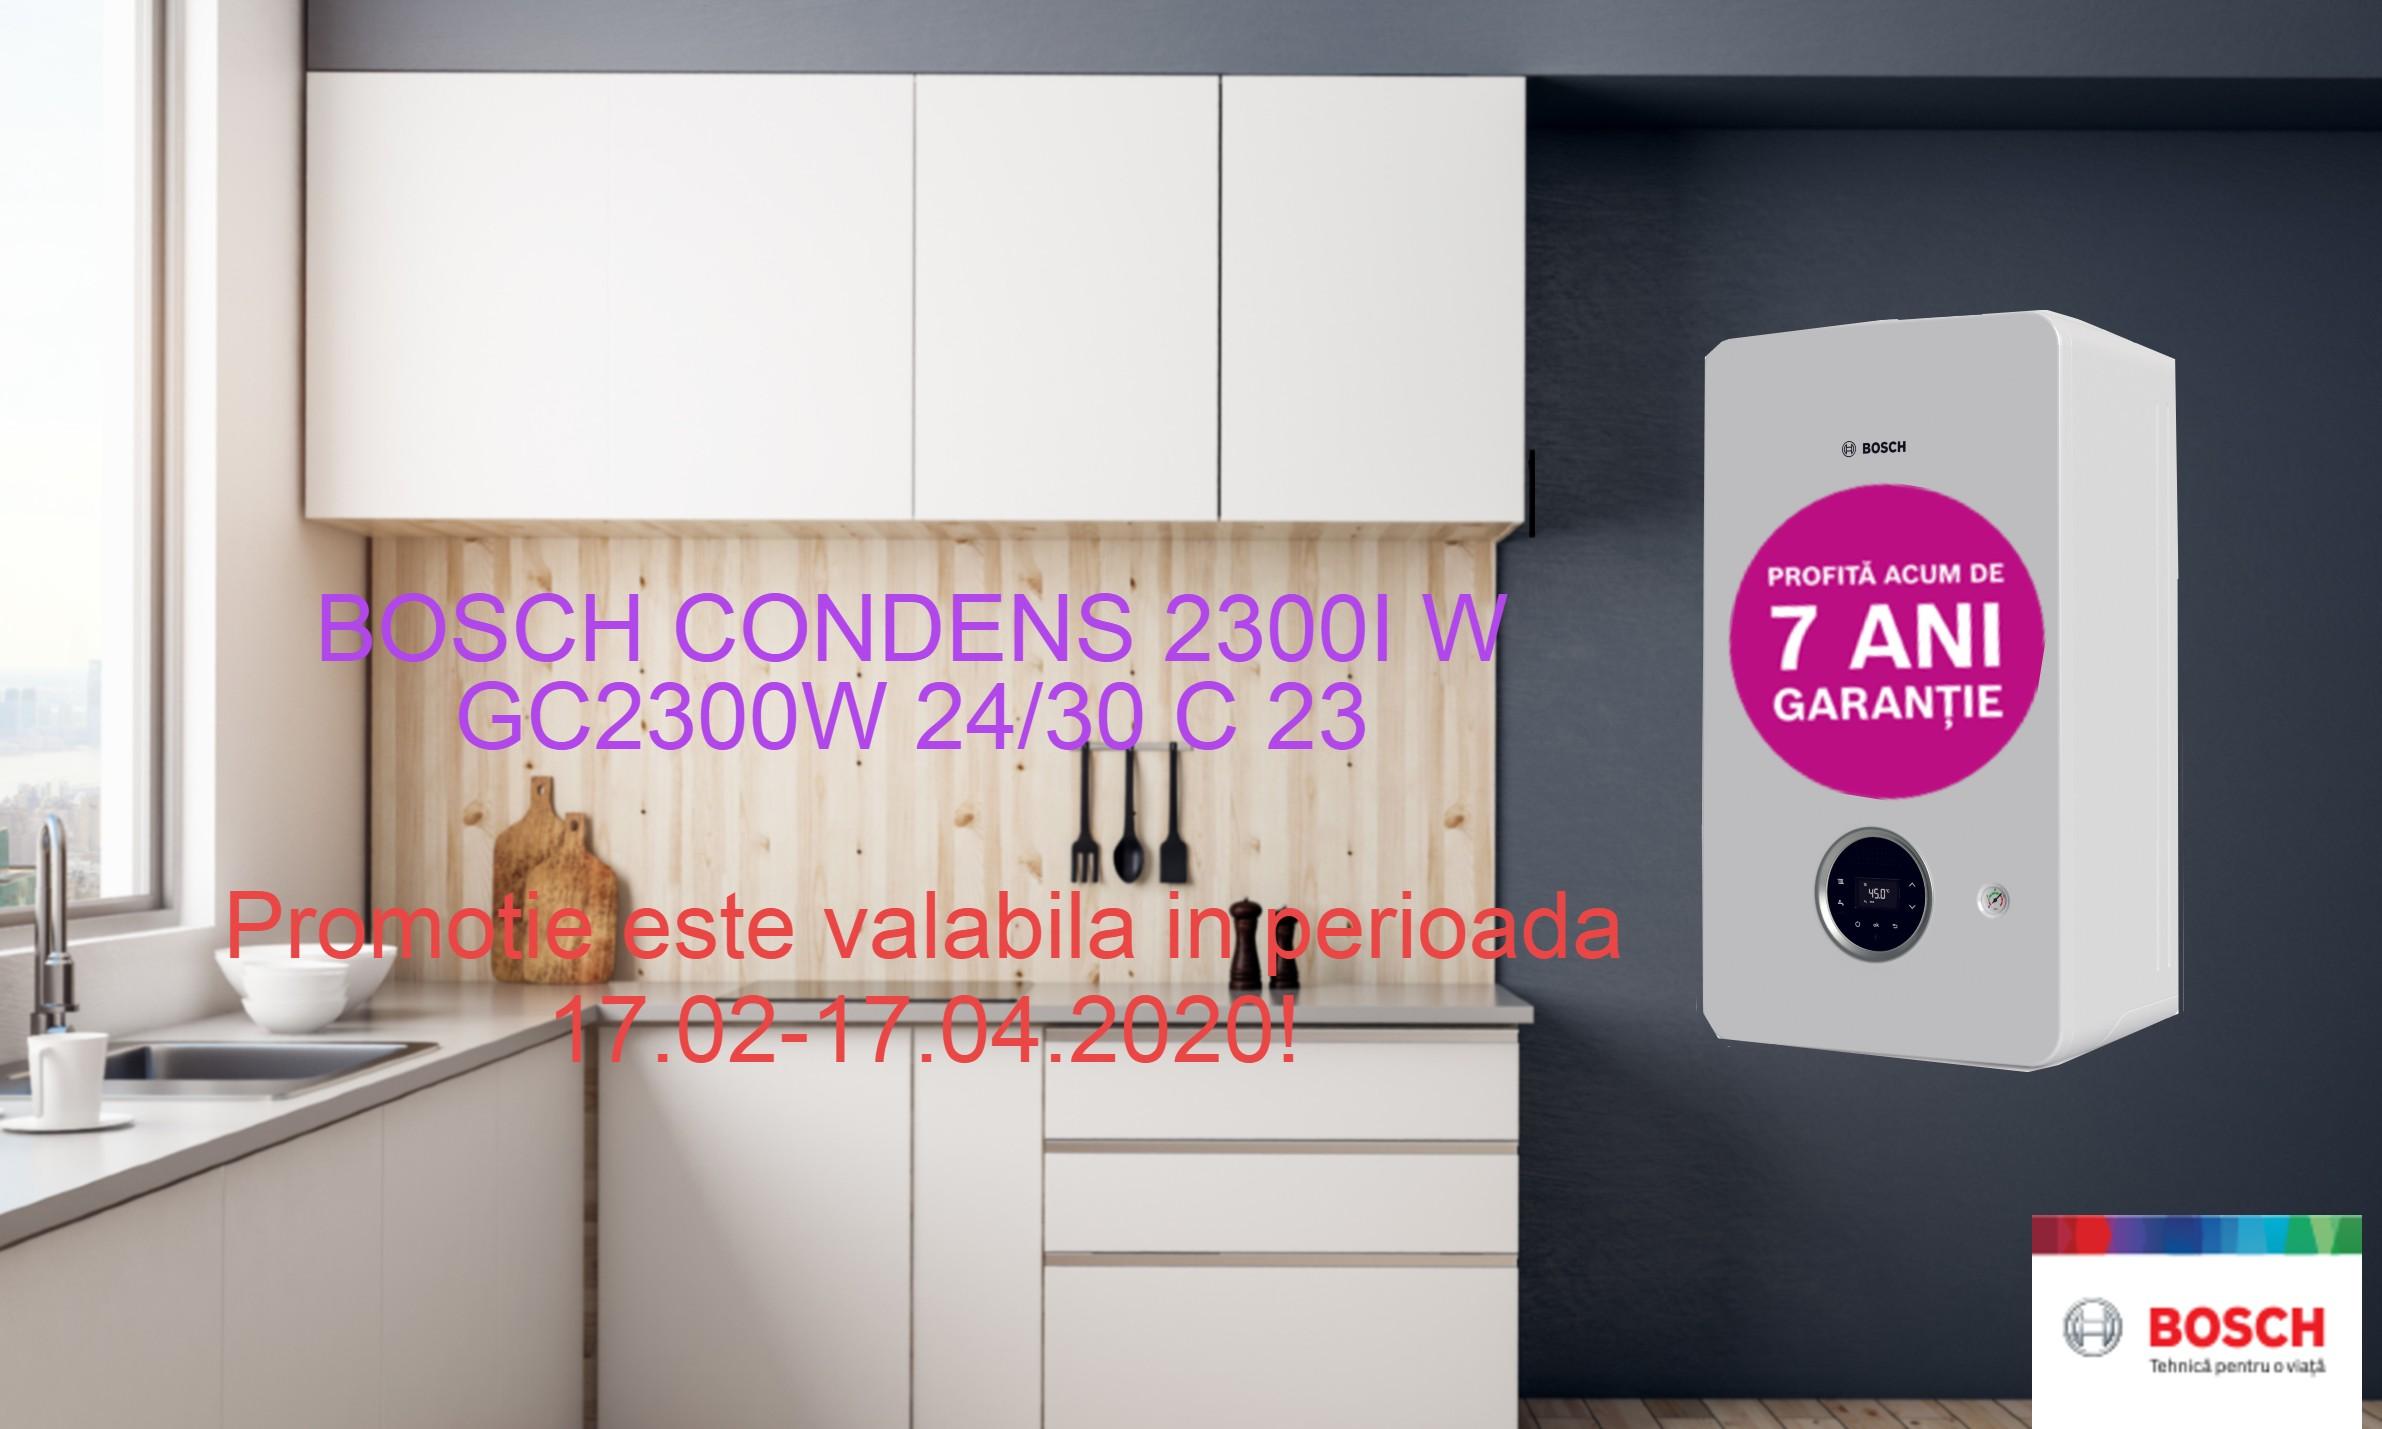 Promotie Bosch Condens 2300